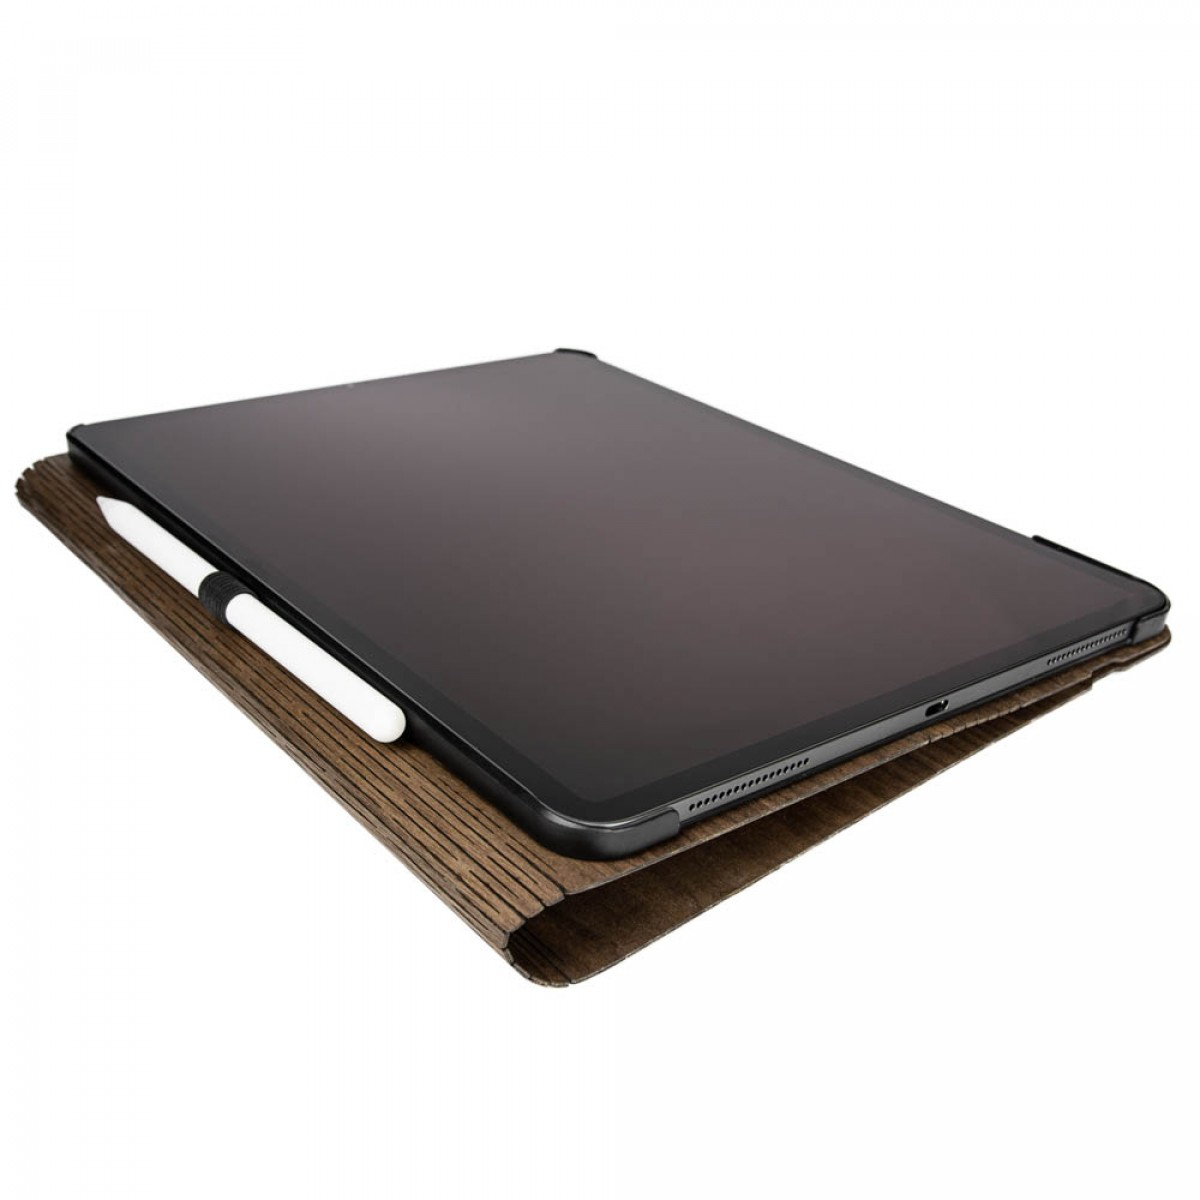 JUNGHOLZ Design WoodCase, Tablet, iPad Pro 12.9''